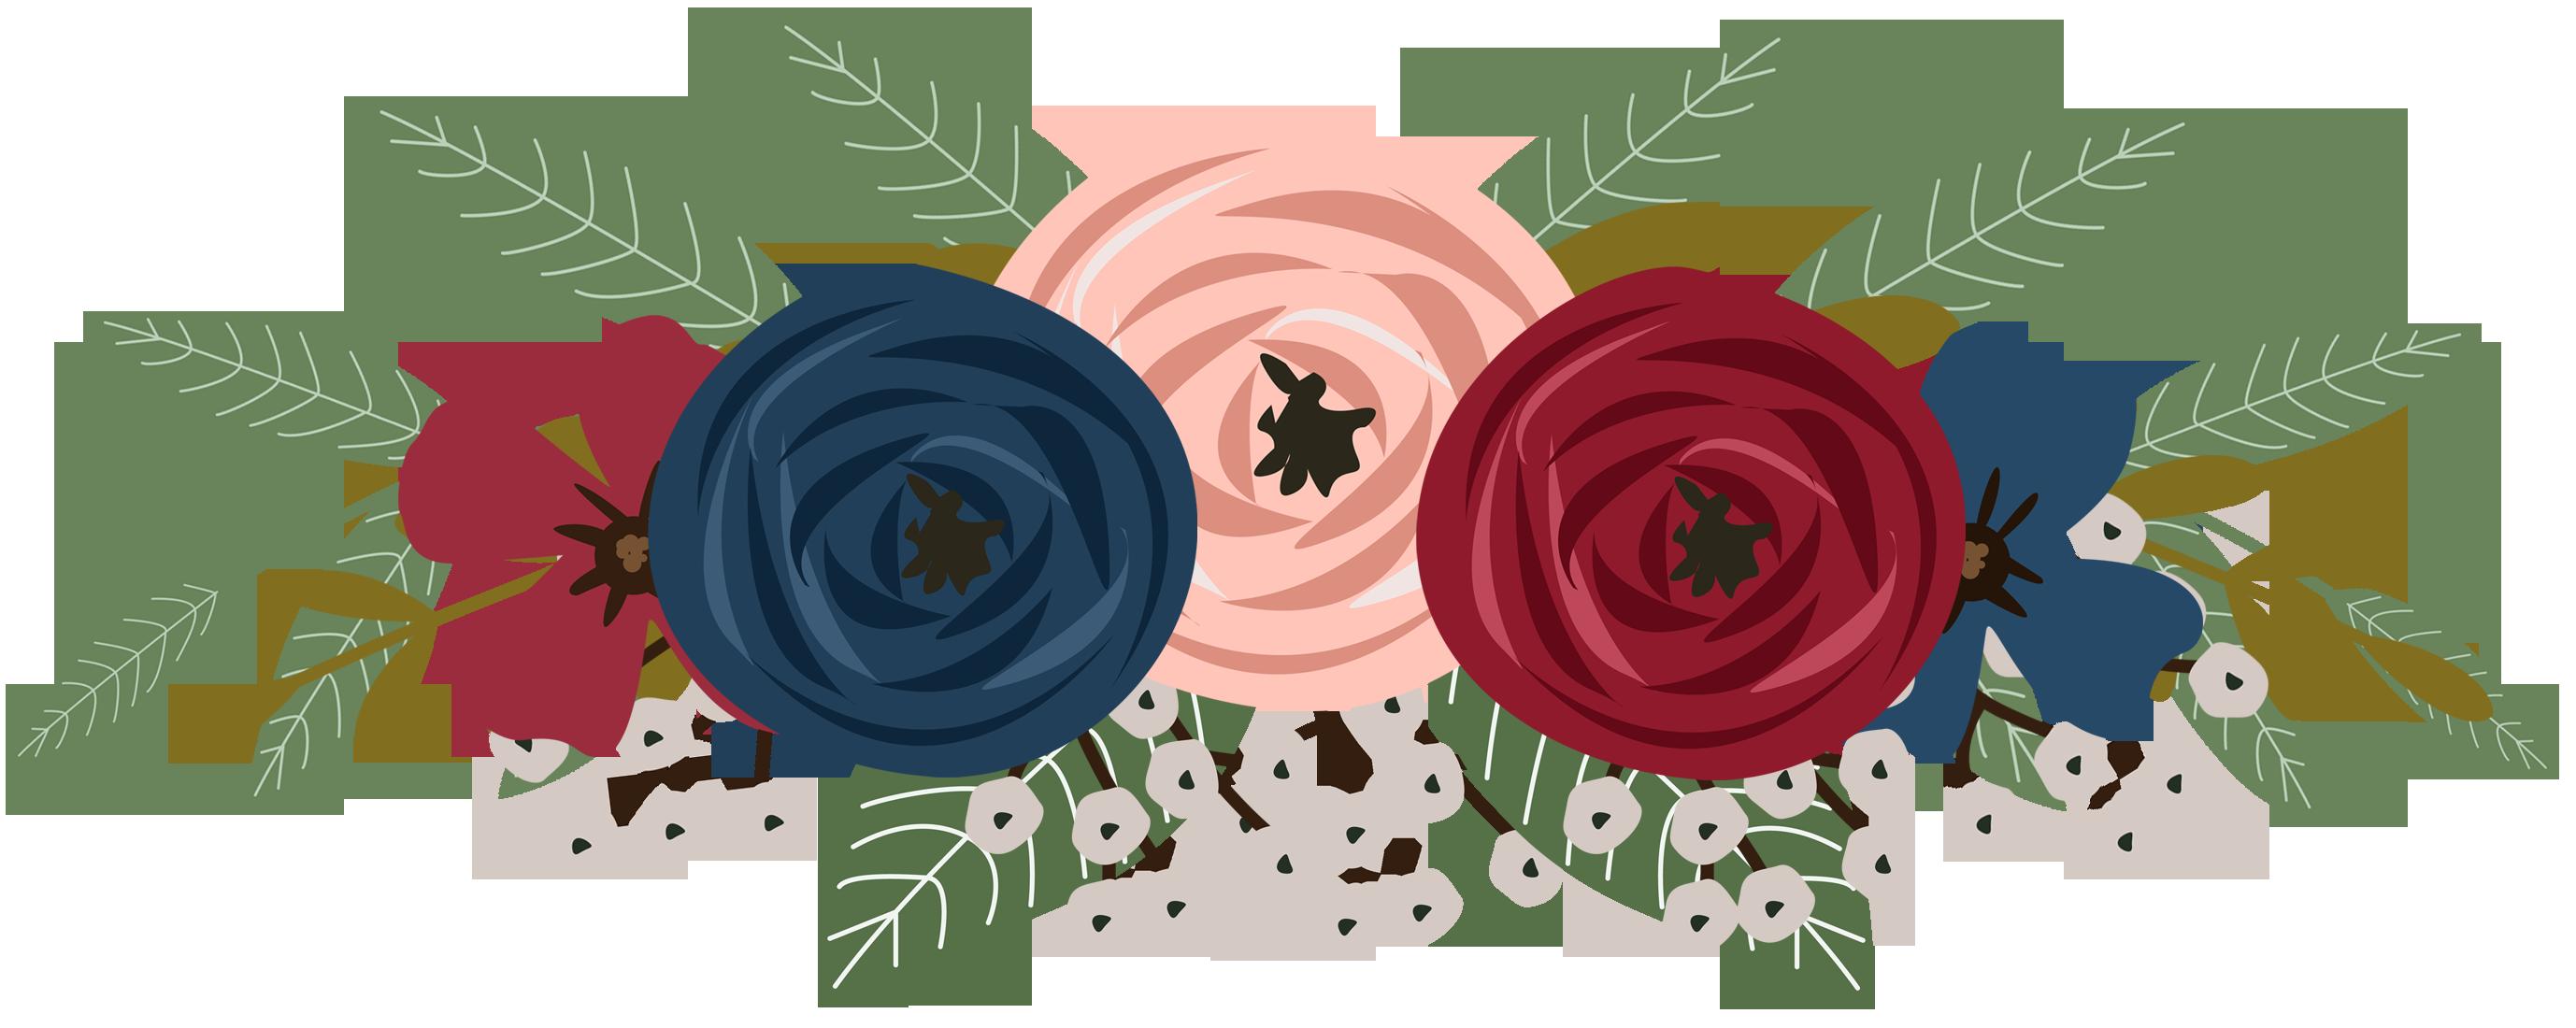 jennyL_blossom_party_bouquet4